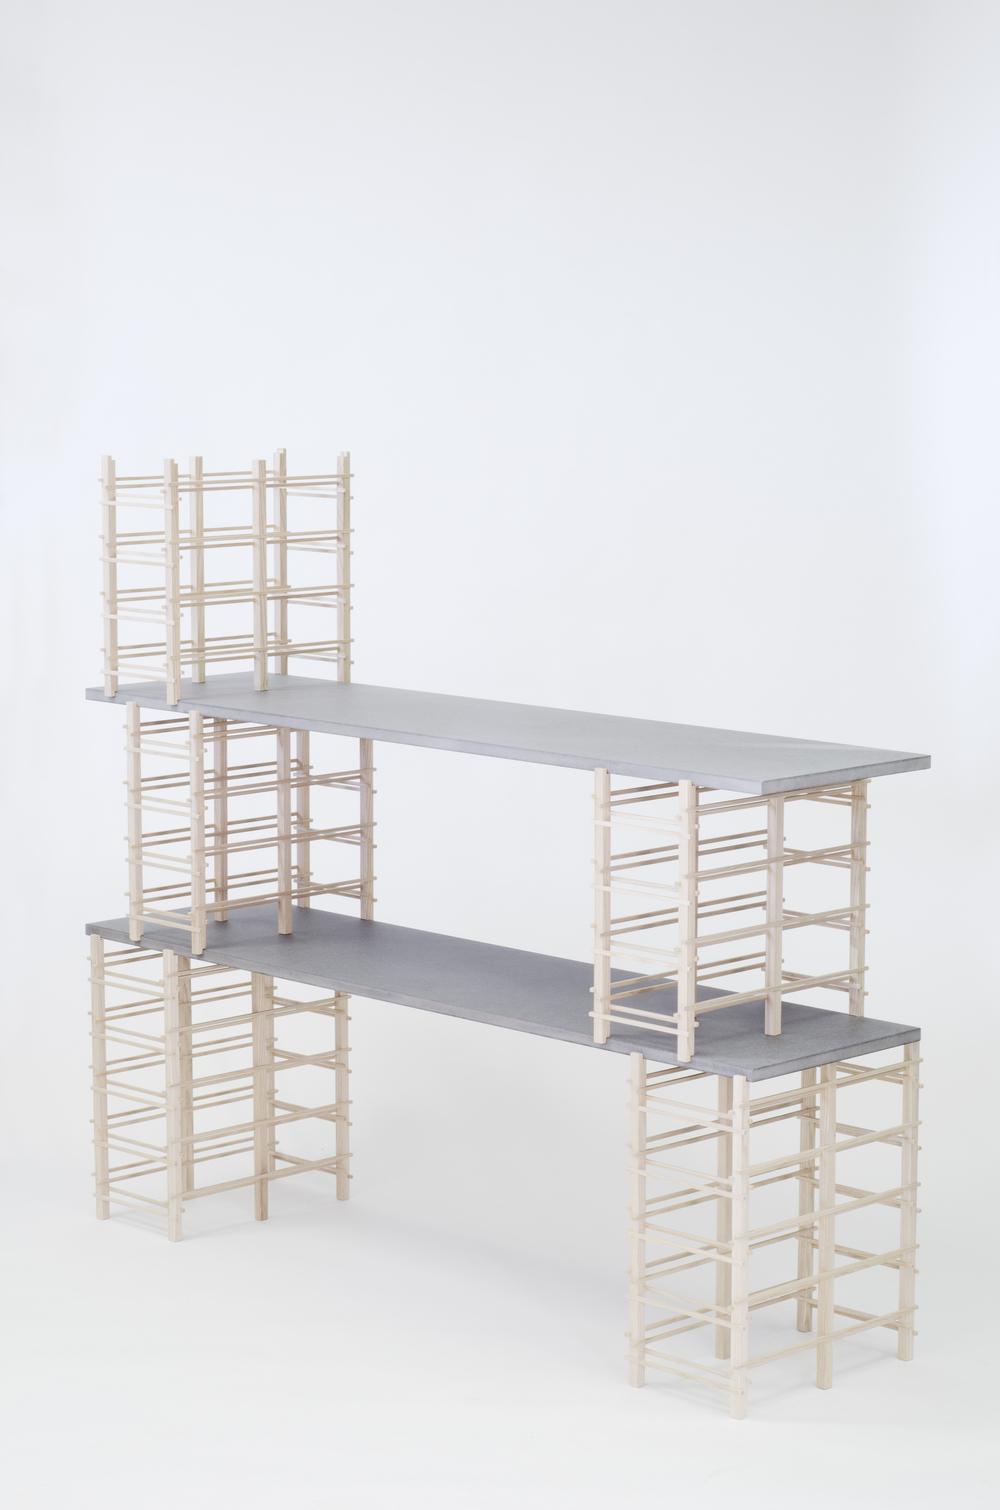 Scaffold by Charlie Styrbjörn Nilsson  (3).JPG